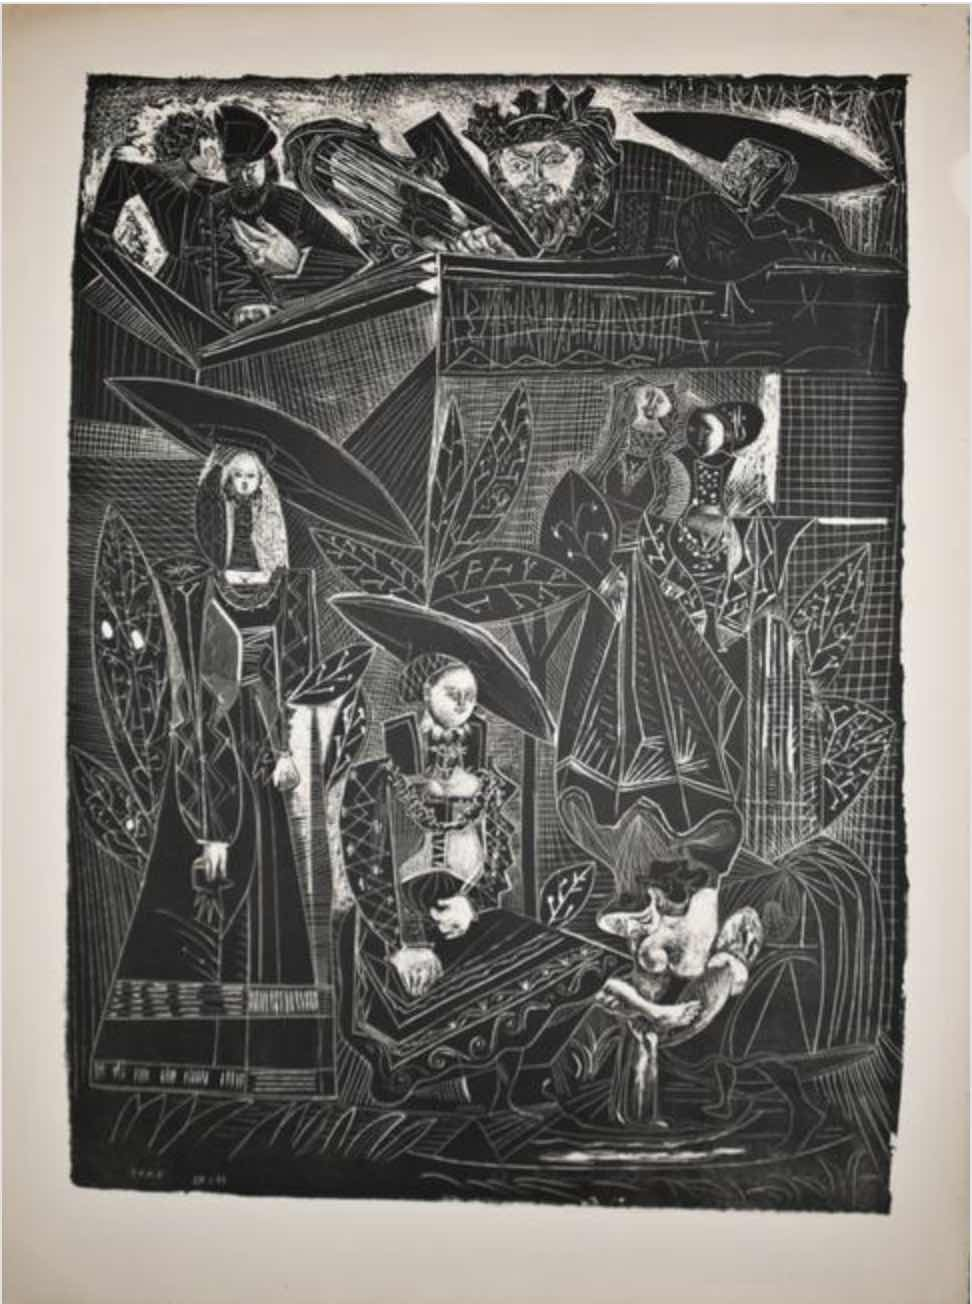 David et Bethsabée by Picasso